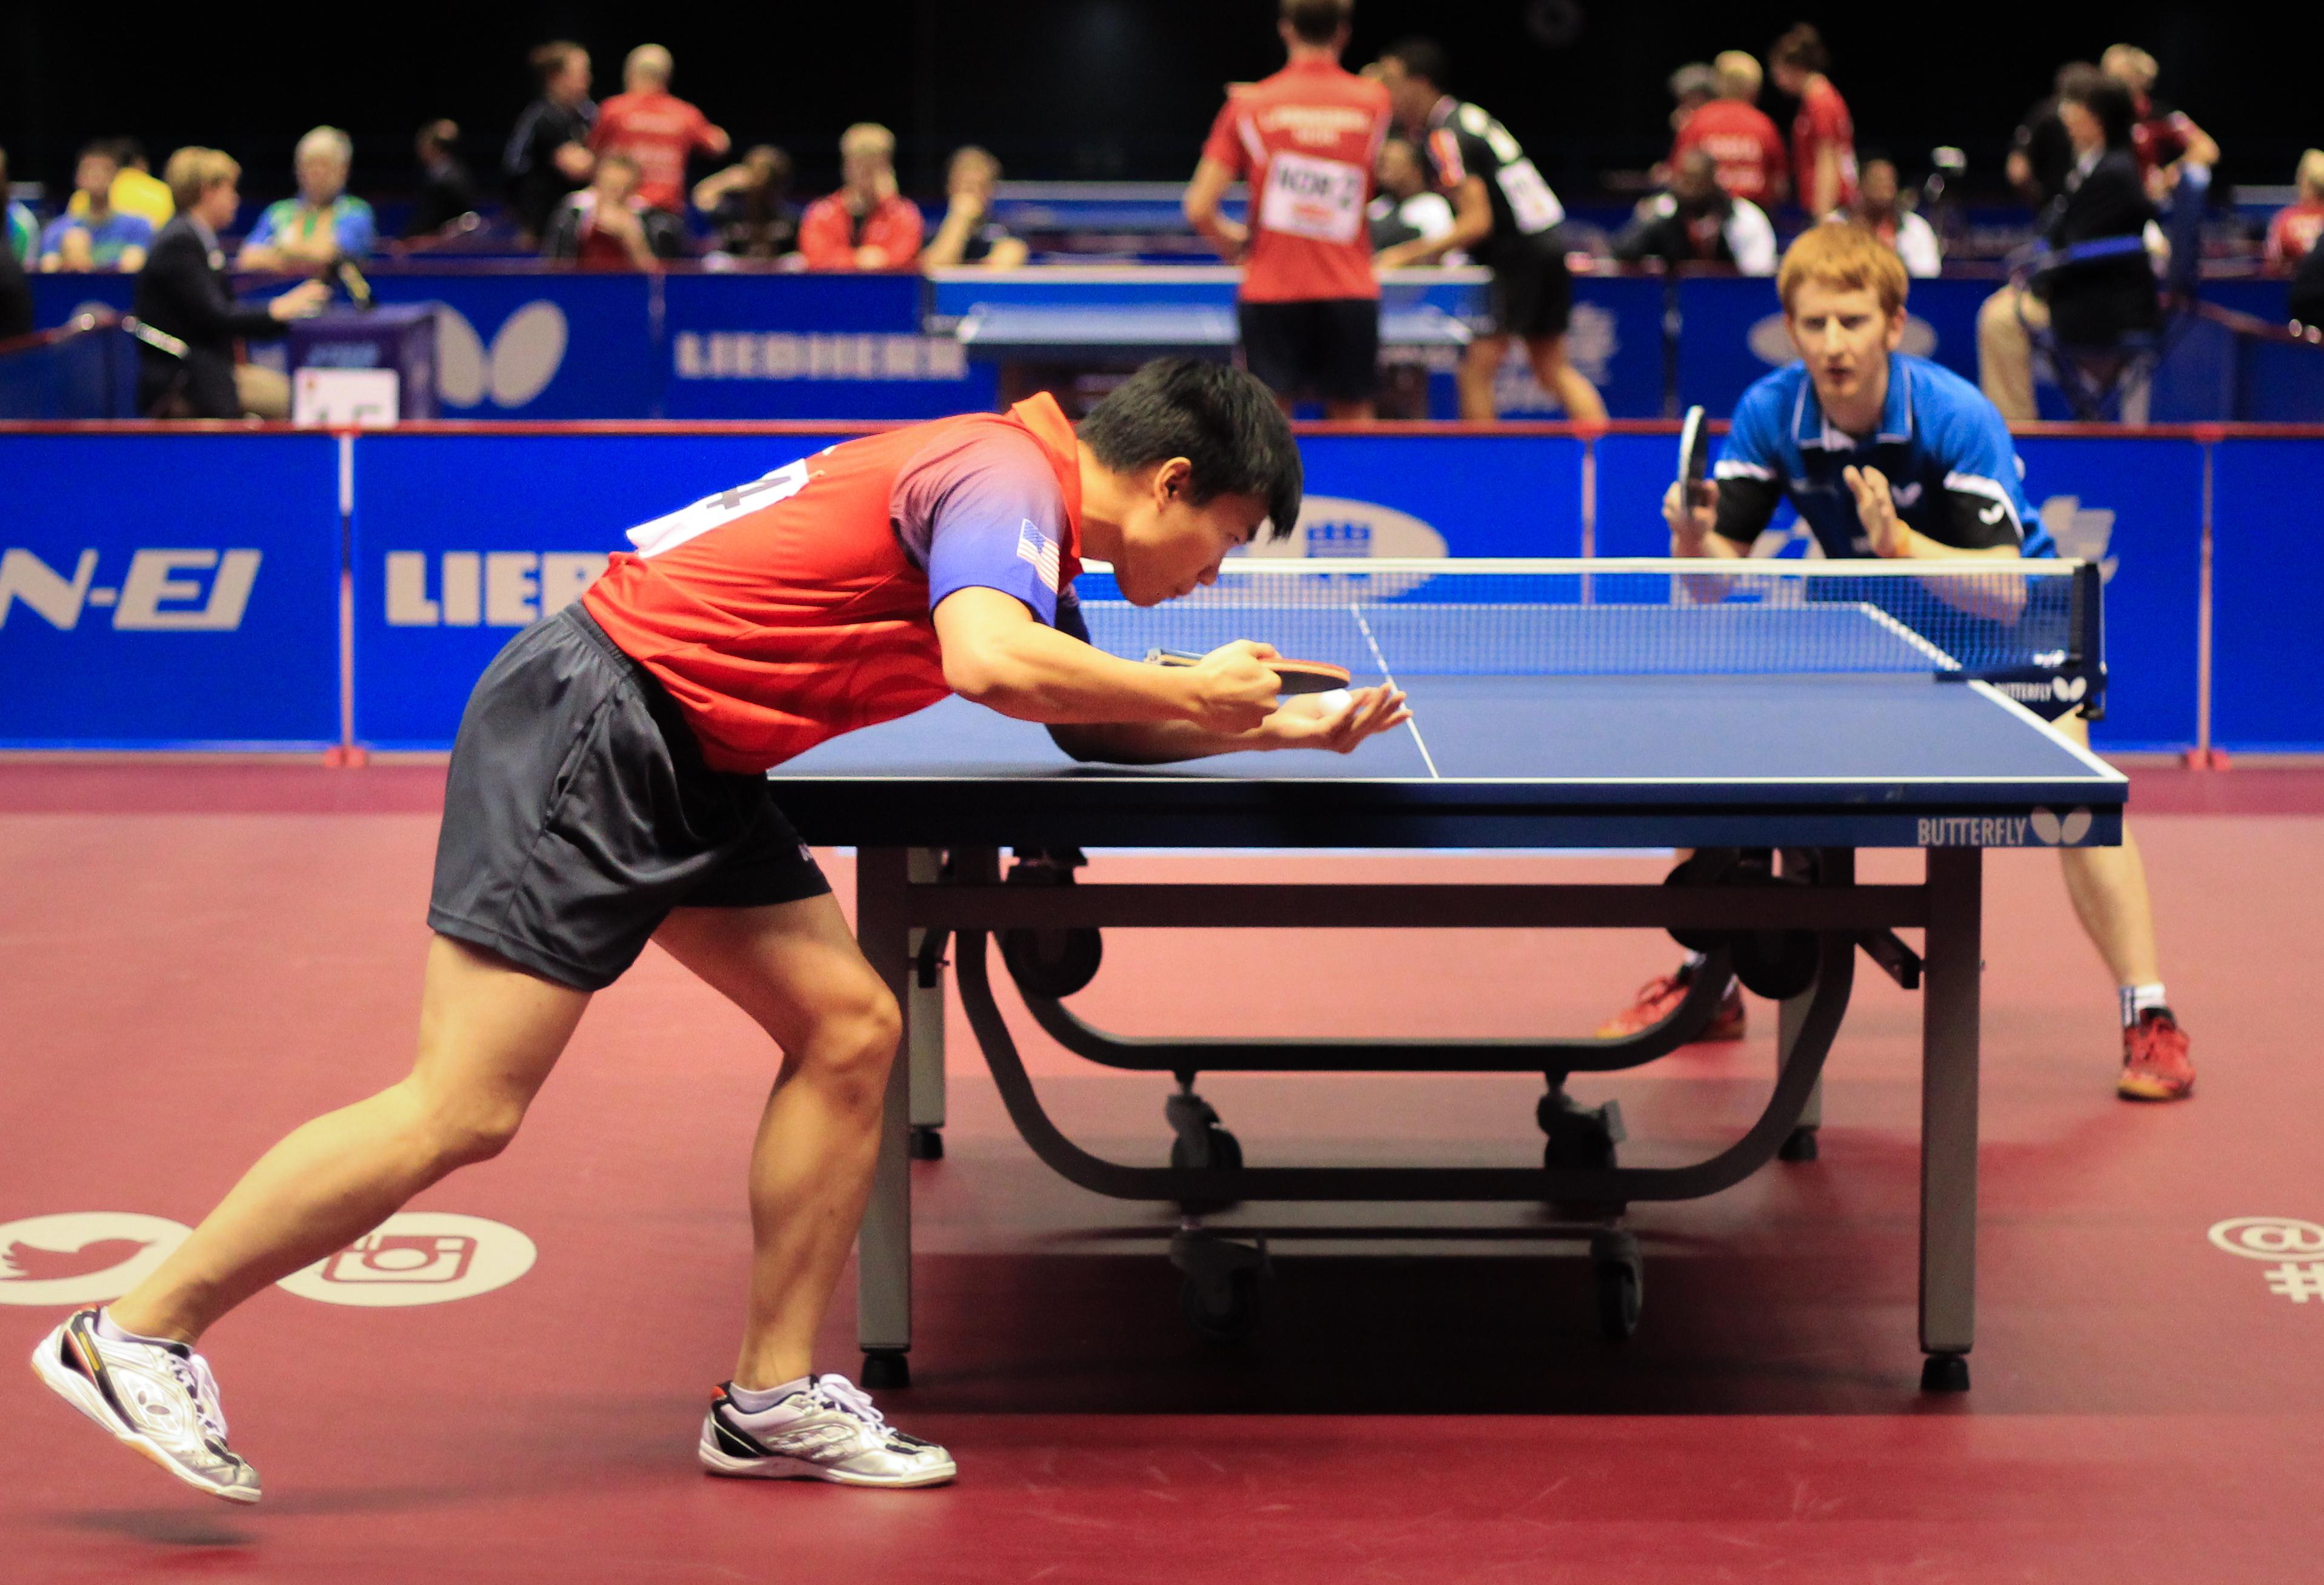 Tokyo 2014 world team table tennis championships the - Table tennis world championship 2014 ...